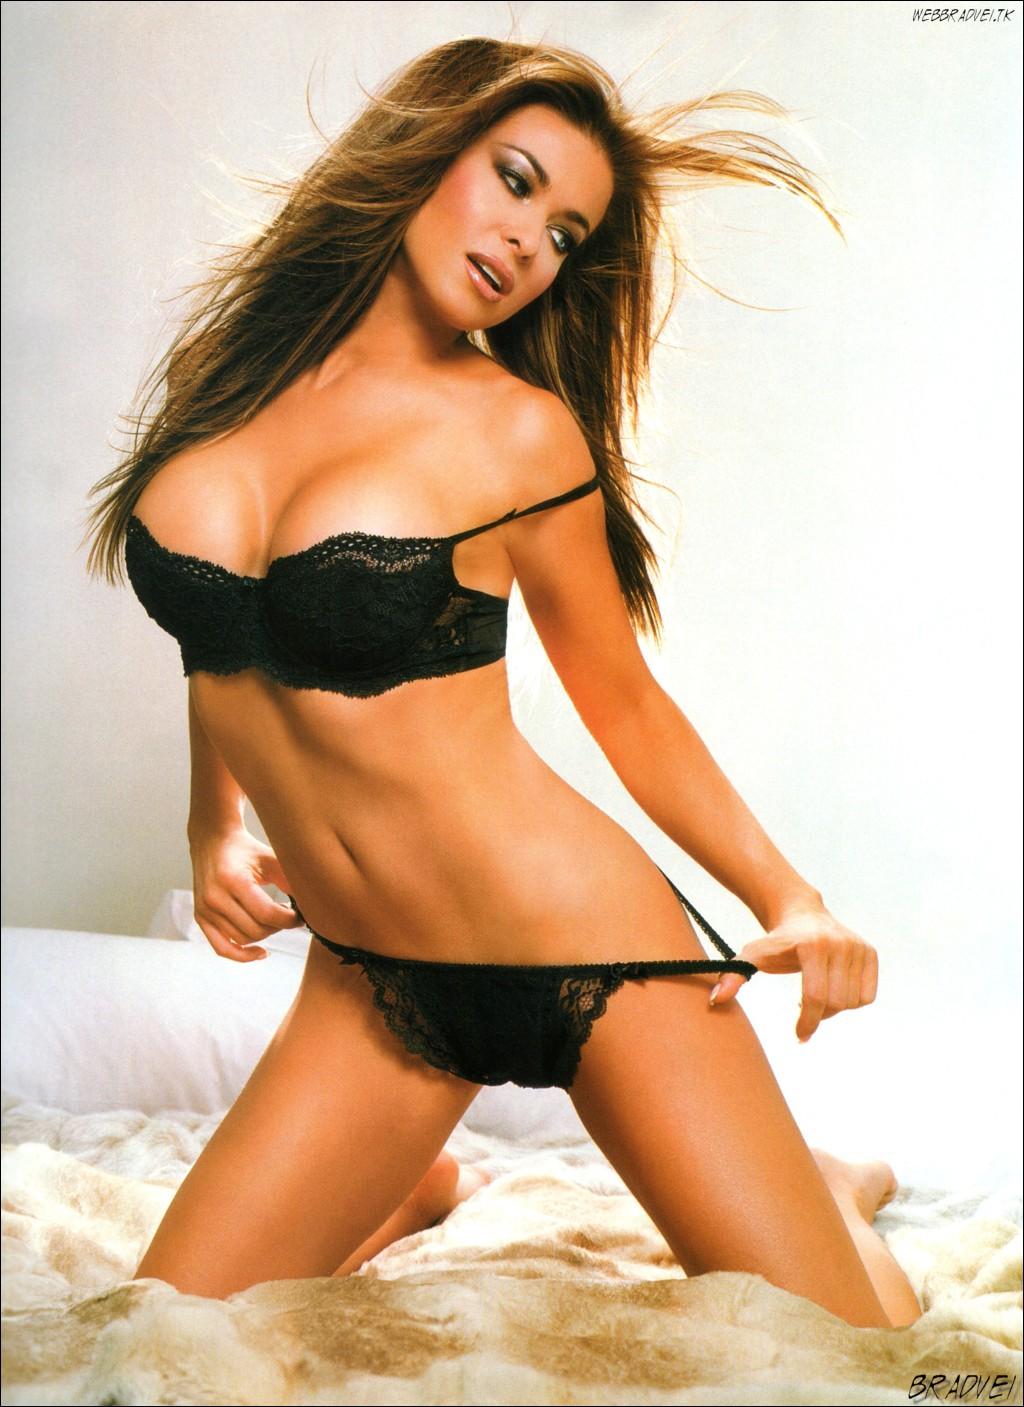 http://3.bp.blogspot.com/-tQ3MFFU_k3o/UKzd1fWRqfI/AAAAAAAAWeM/lxFsycHsk6Q/s1600/Carmen-Electra-Hot-Pics-3.jpg